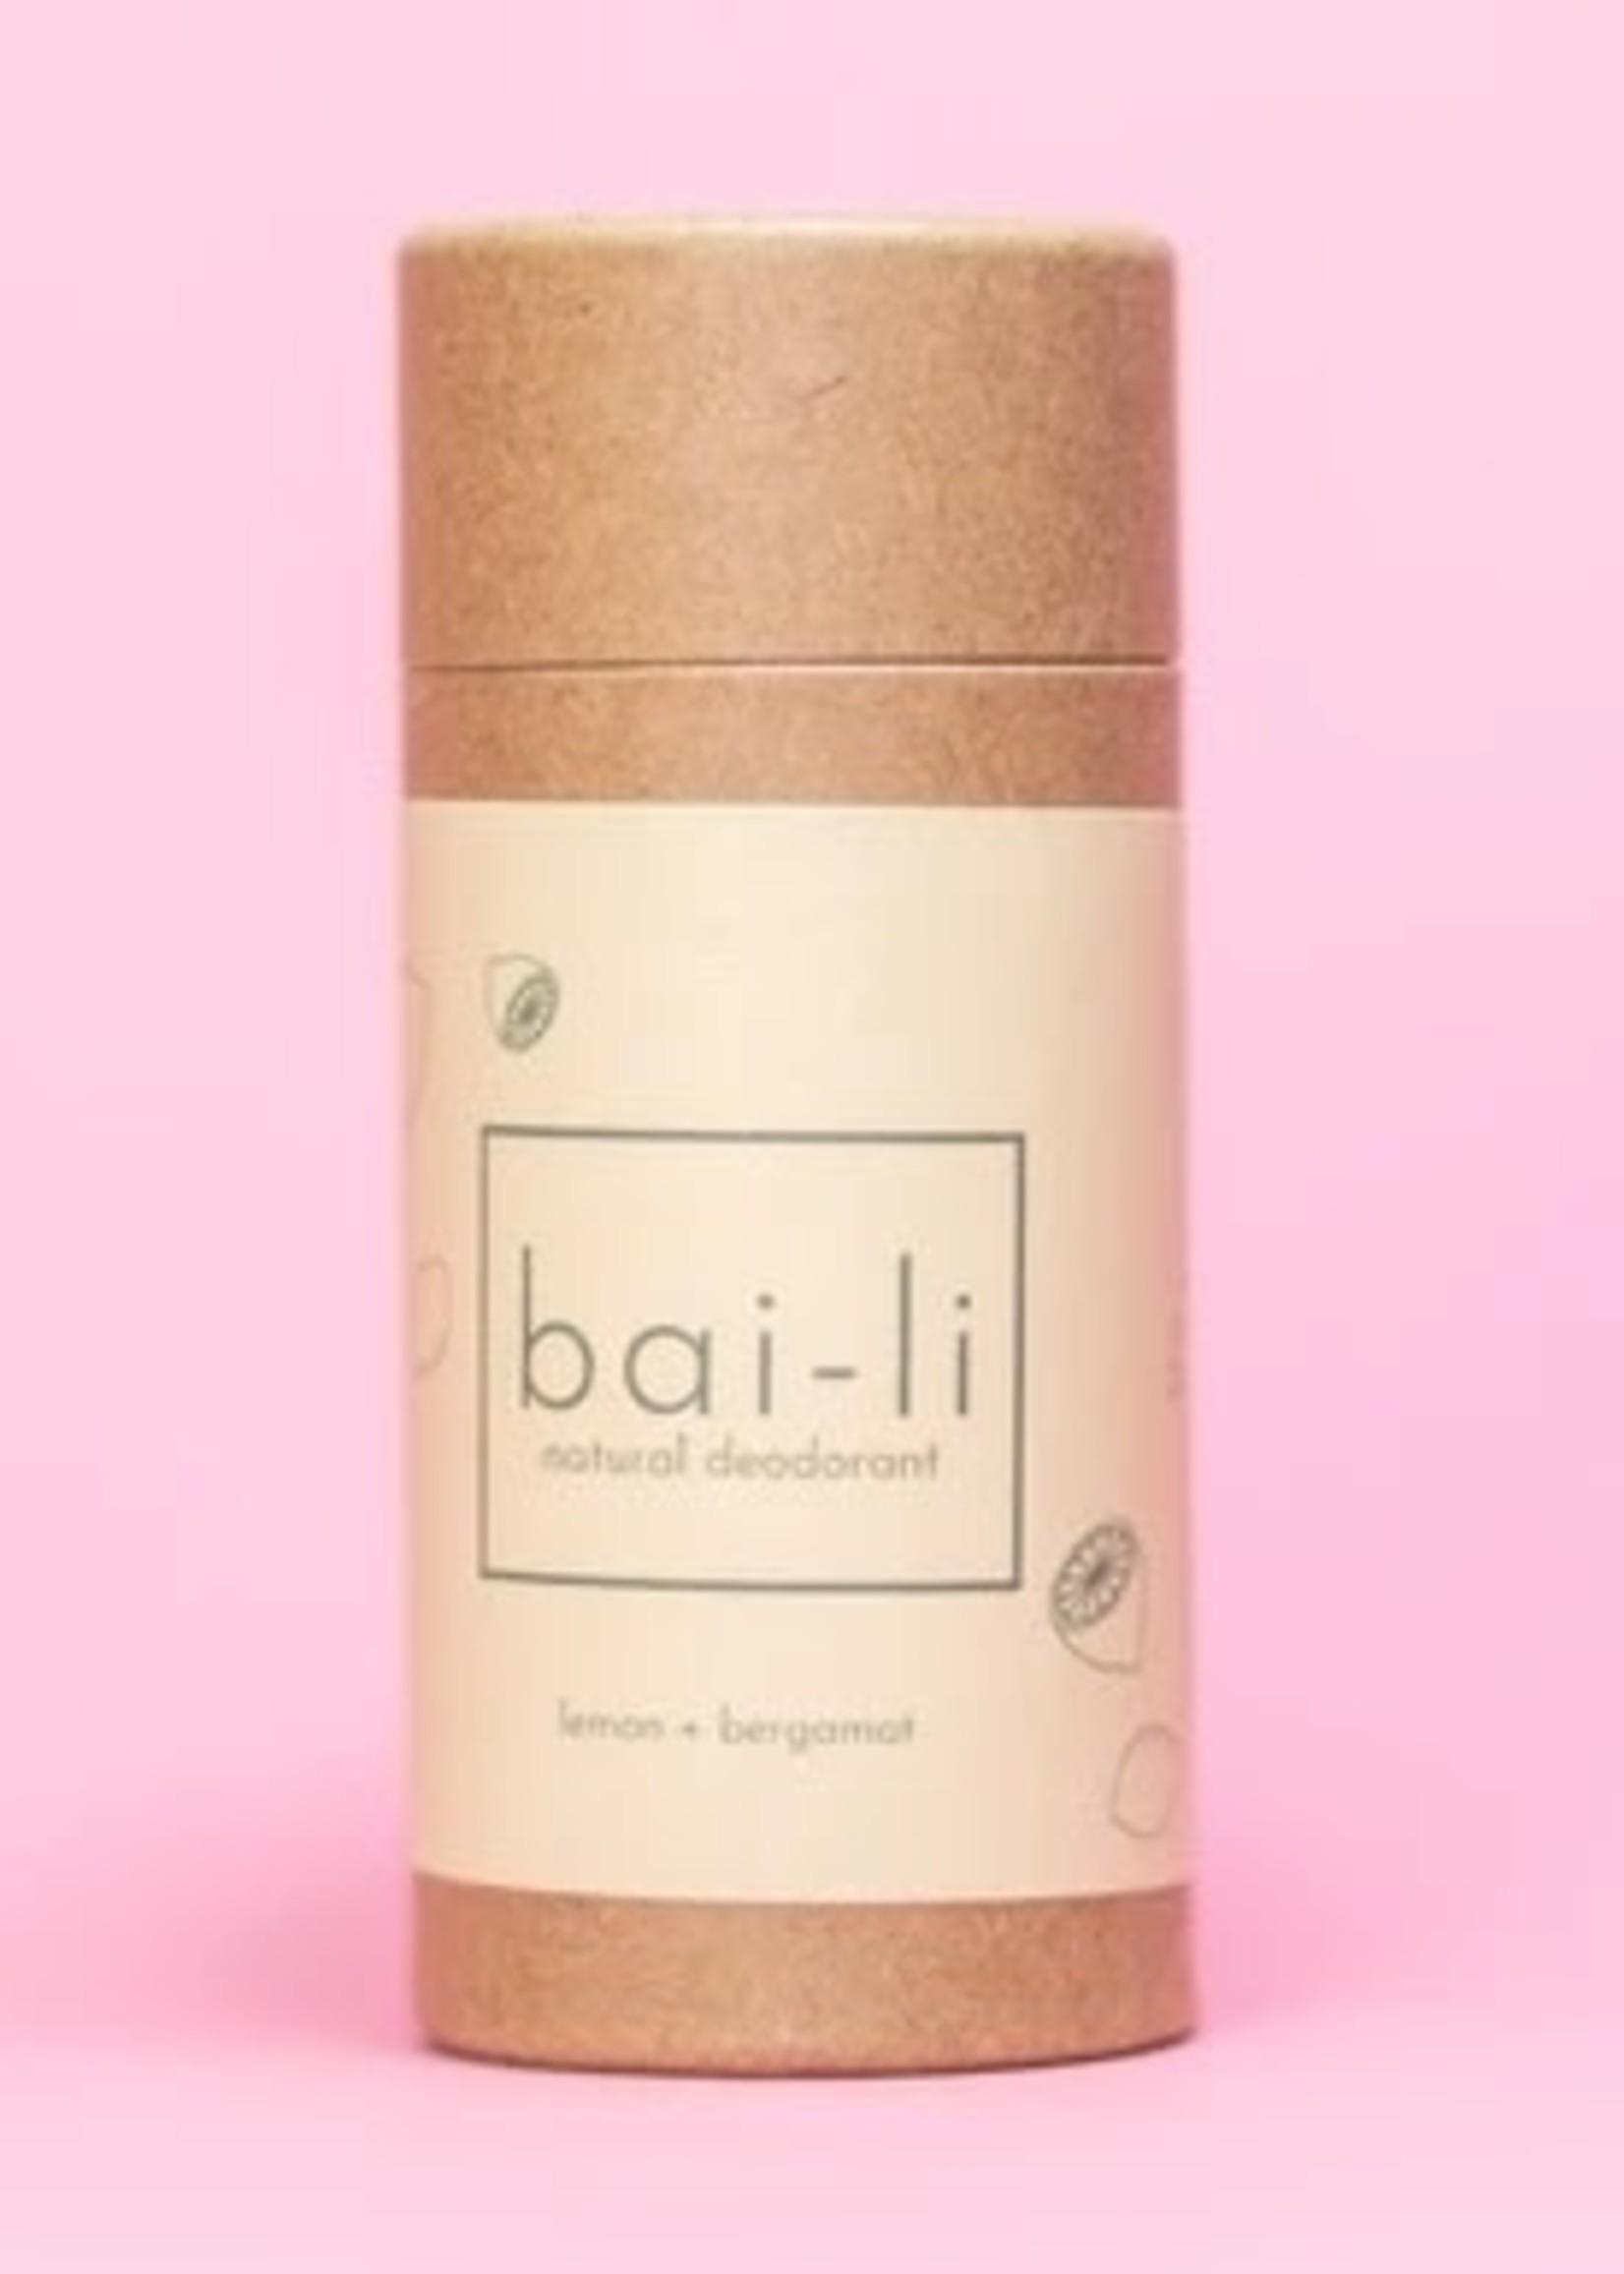 Bai-li Lemon Bergamot Deodorant